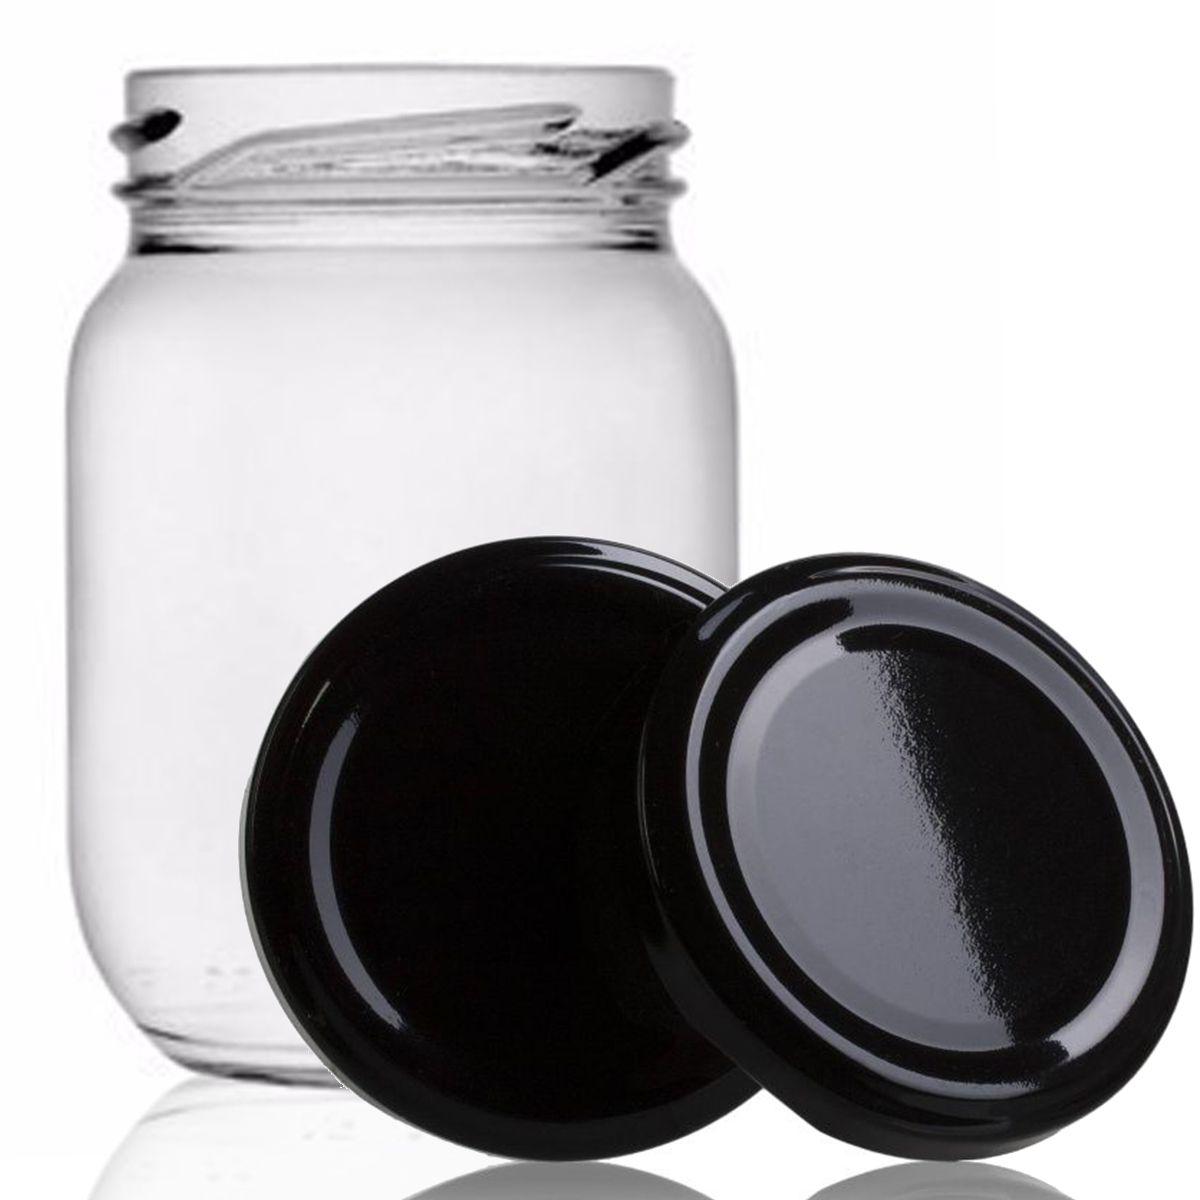 12 Potes De Vidro Conserva 268 Ml Com Tampa Preta + Lacre  - EMPÓRIO PACK